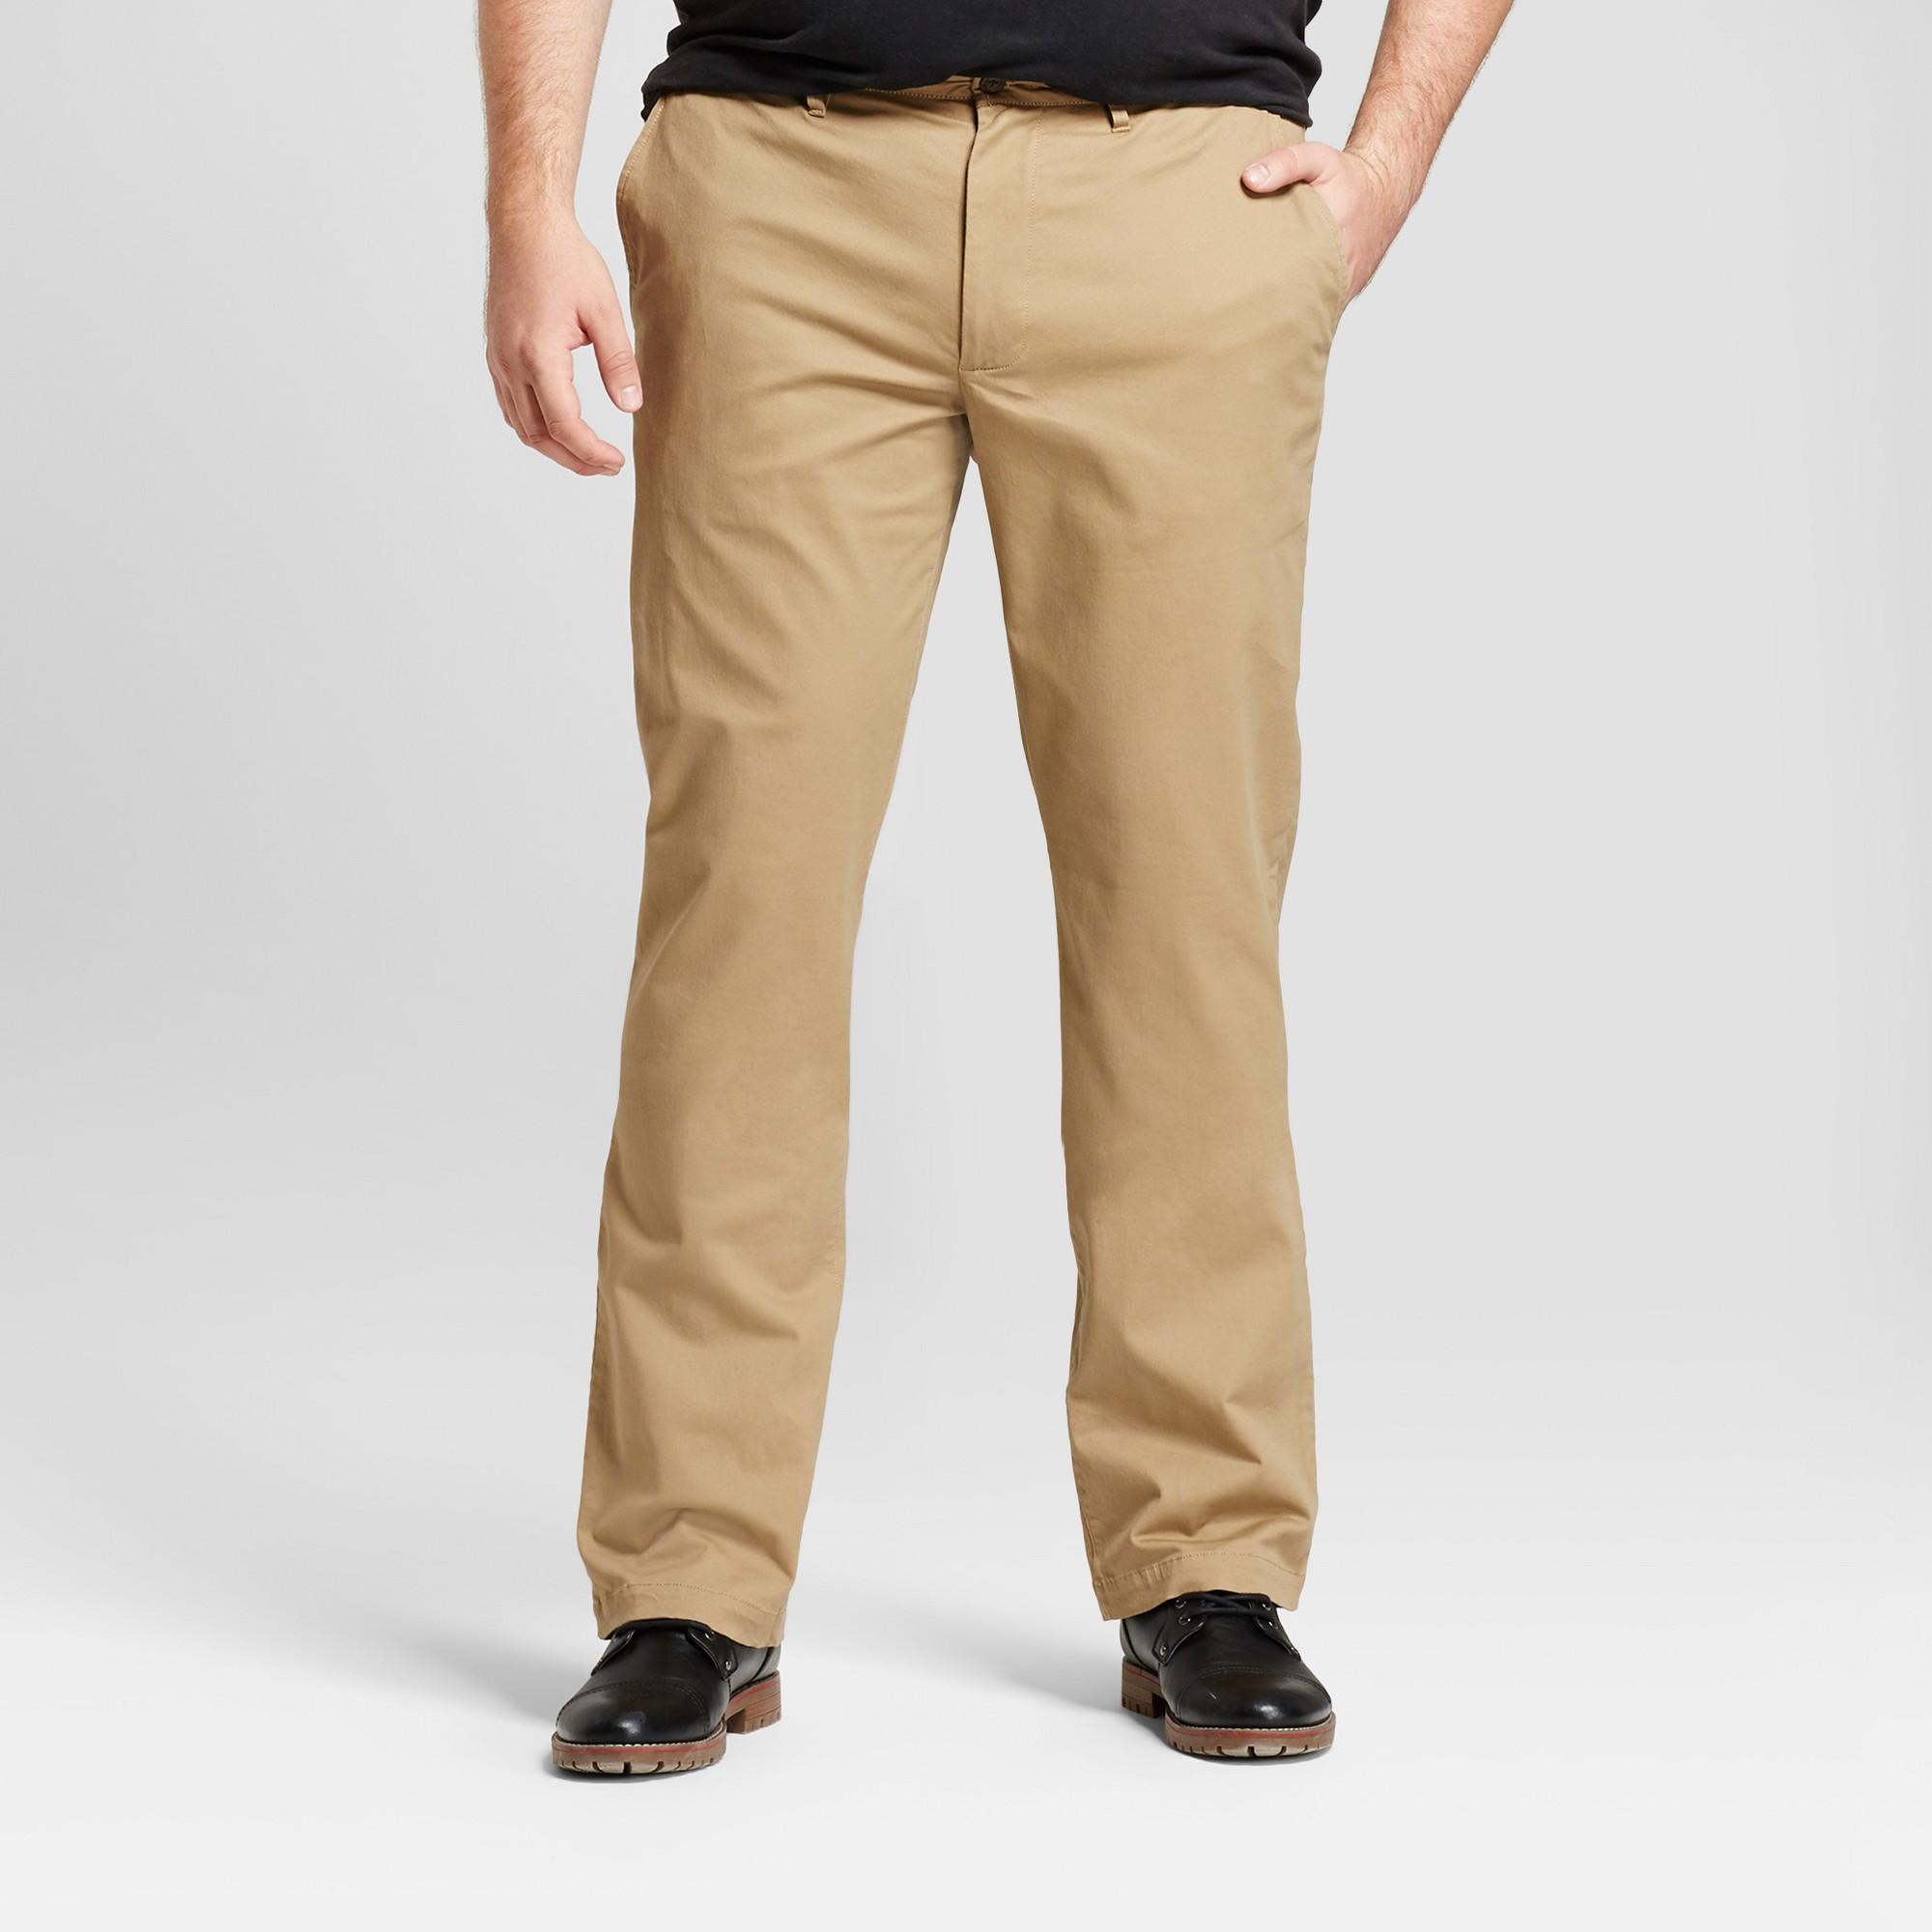 2b2ca9a7 Men's Big & Tall Straight Fit Hennepin Chino Pants - Goodfellow & Co Tan  48x30